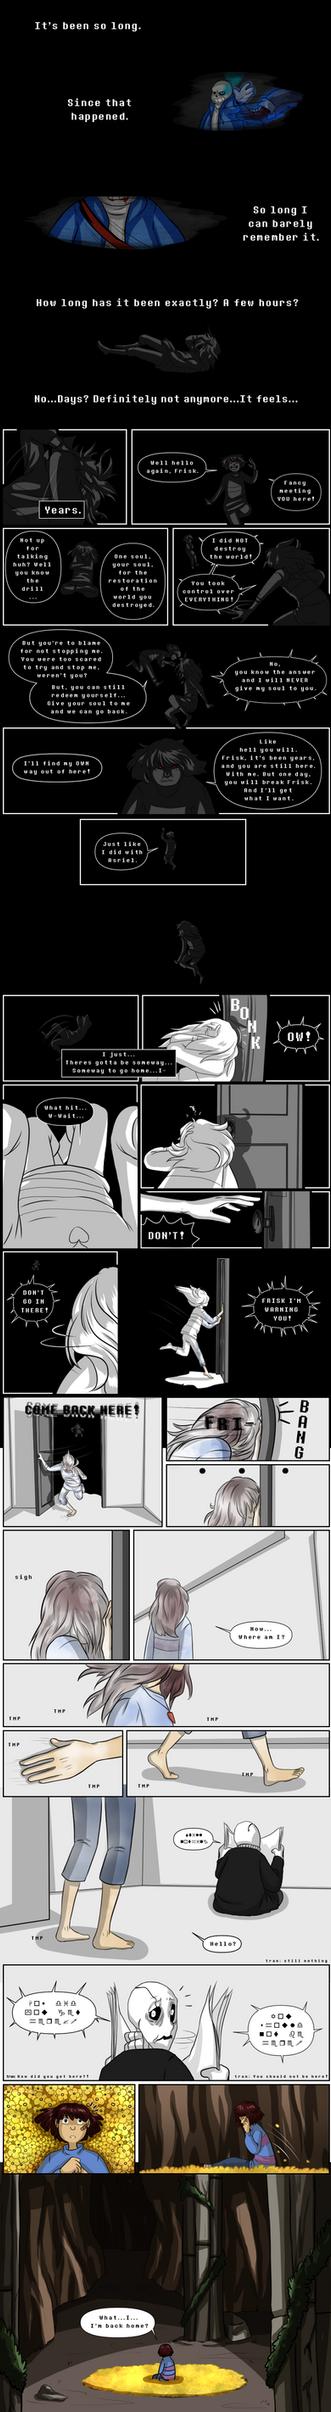 Undertale comic by ZannyHyper